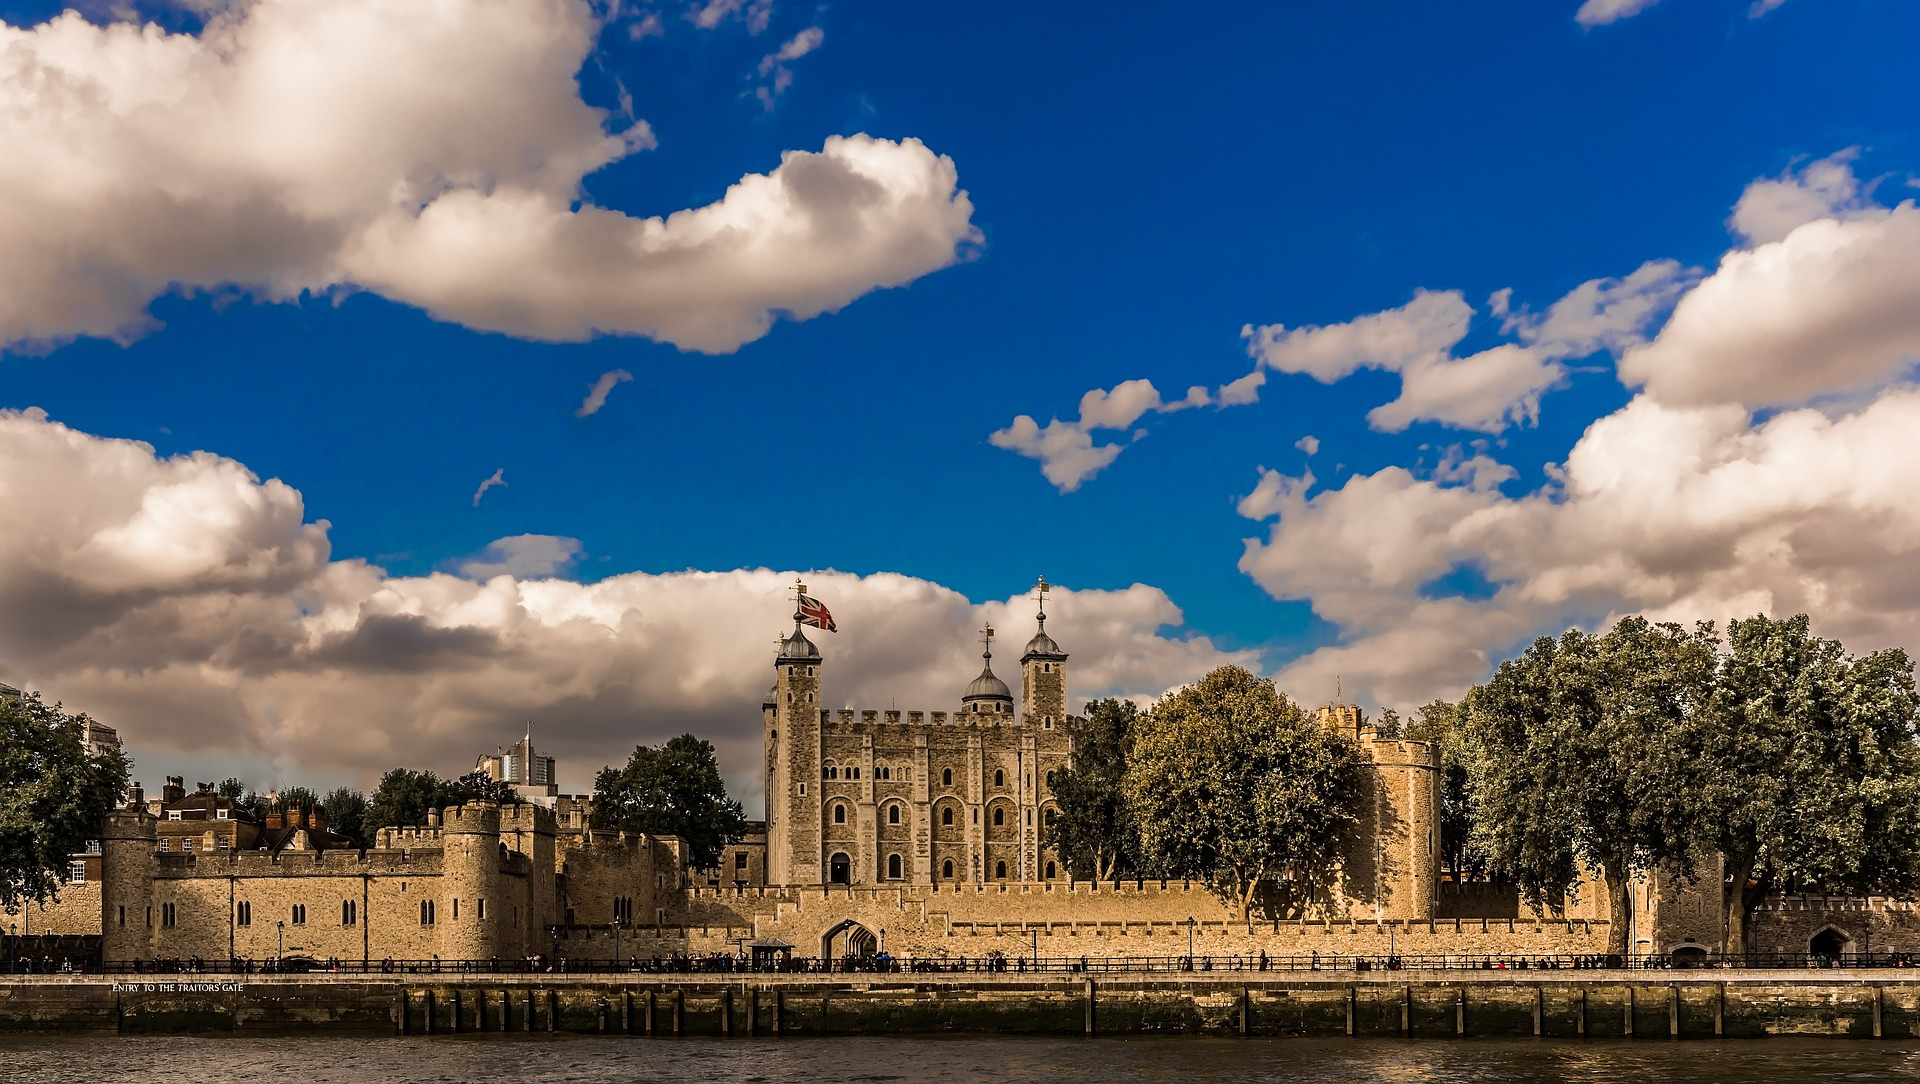 Wonderful summer day at Tower Of London, United Kingdom